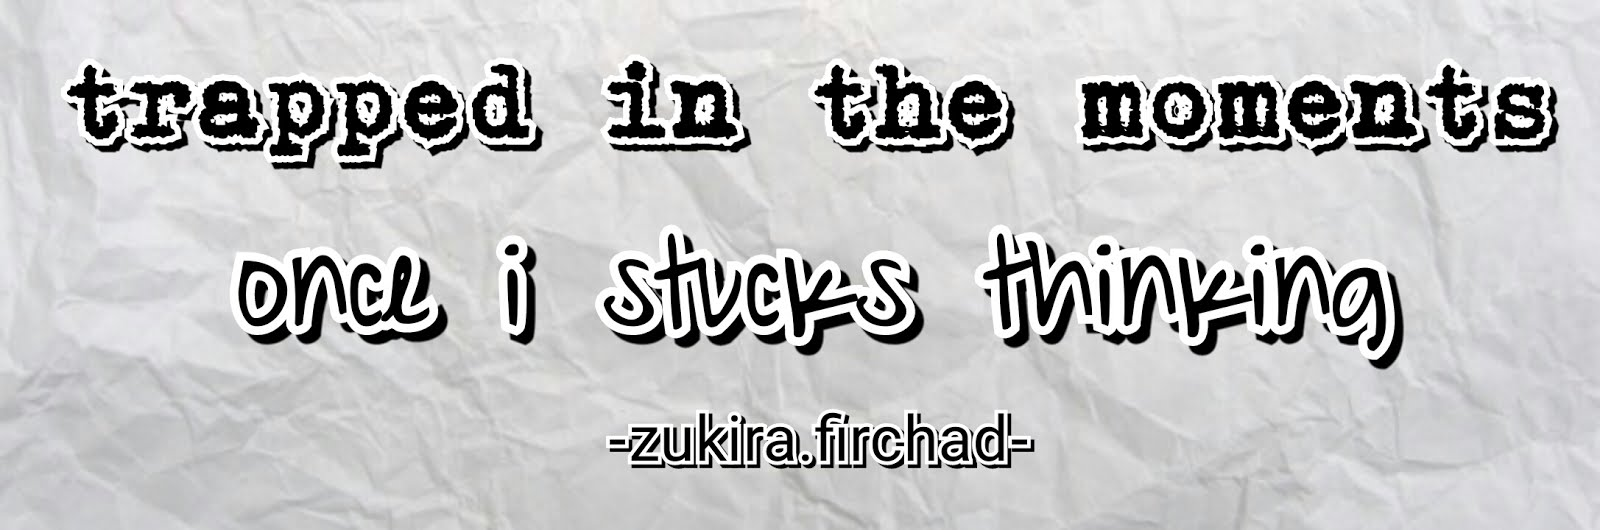 Zukira-Firchad